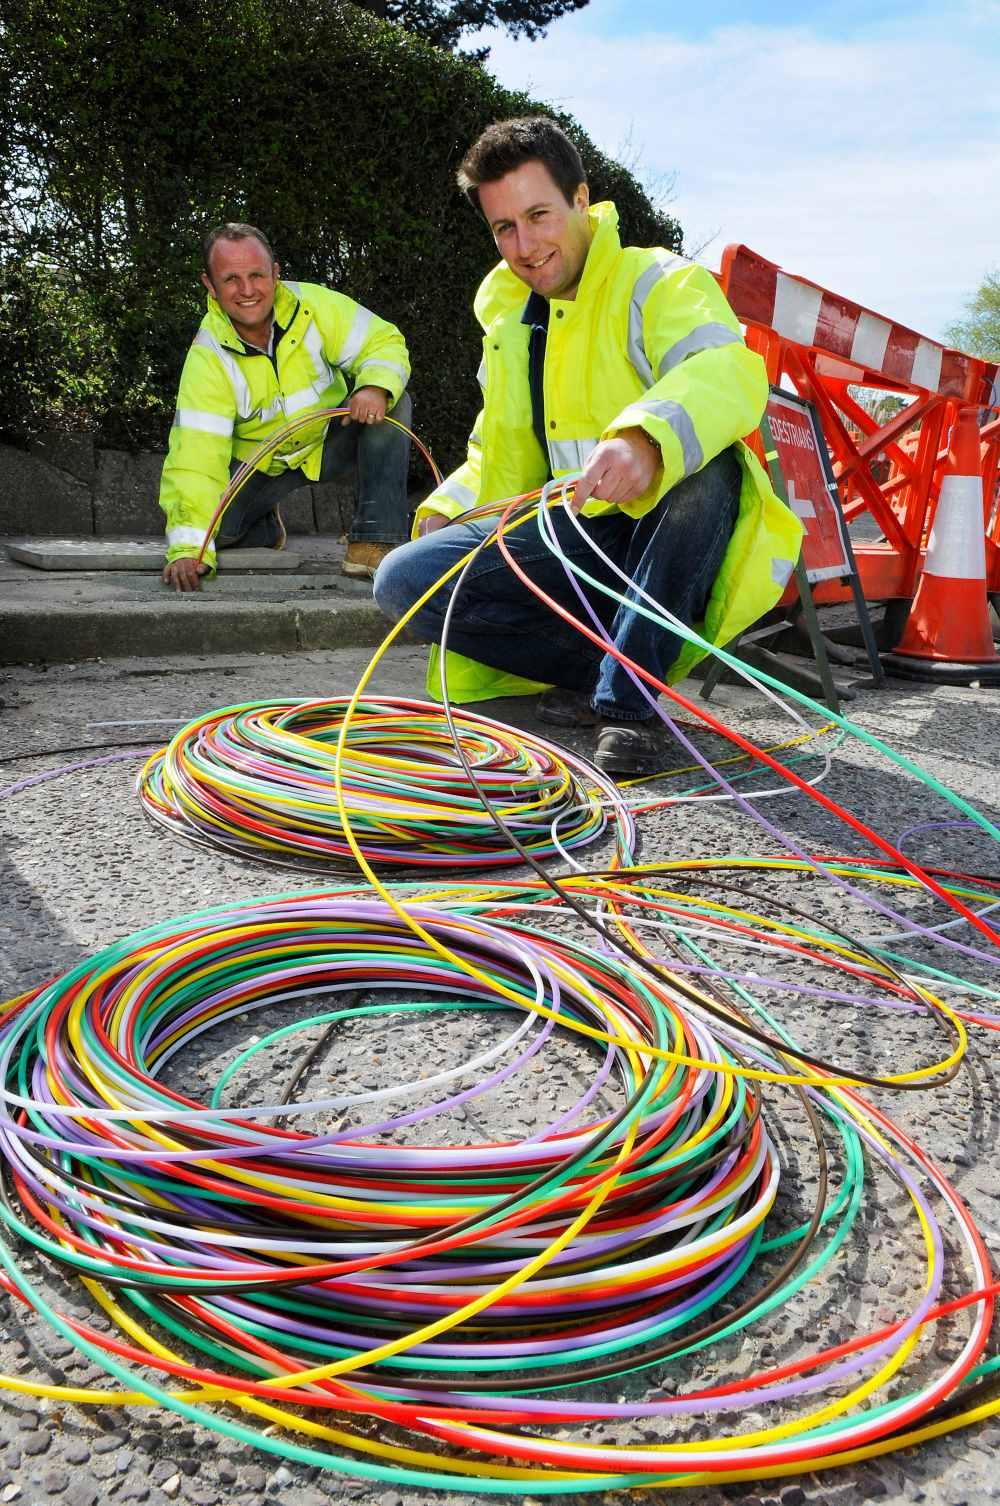 Coventry?s full fibre transformation to deliver multimillion pound economic growth